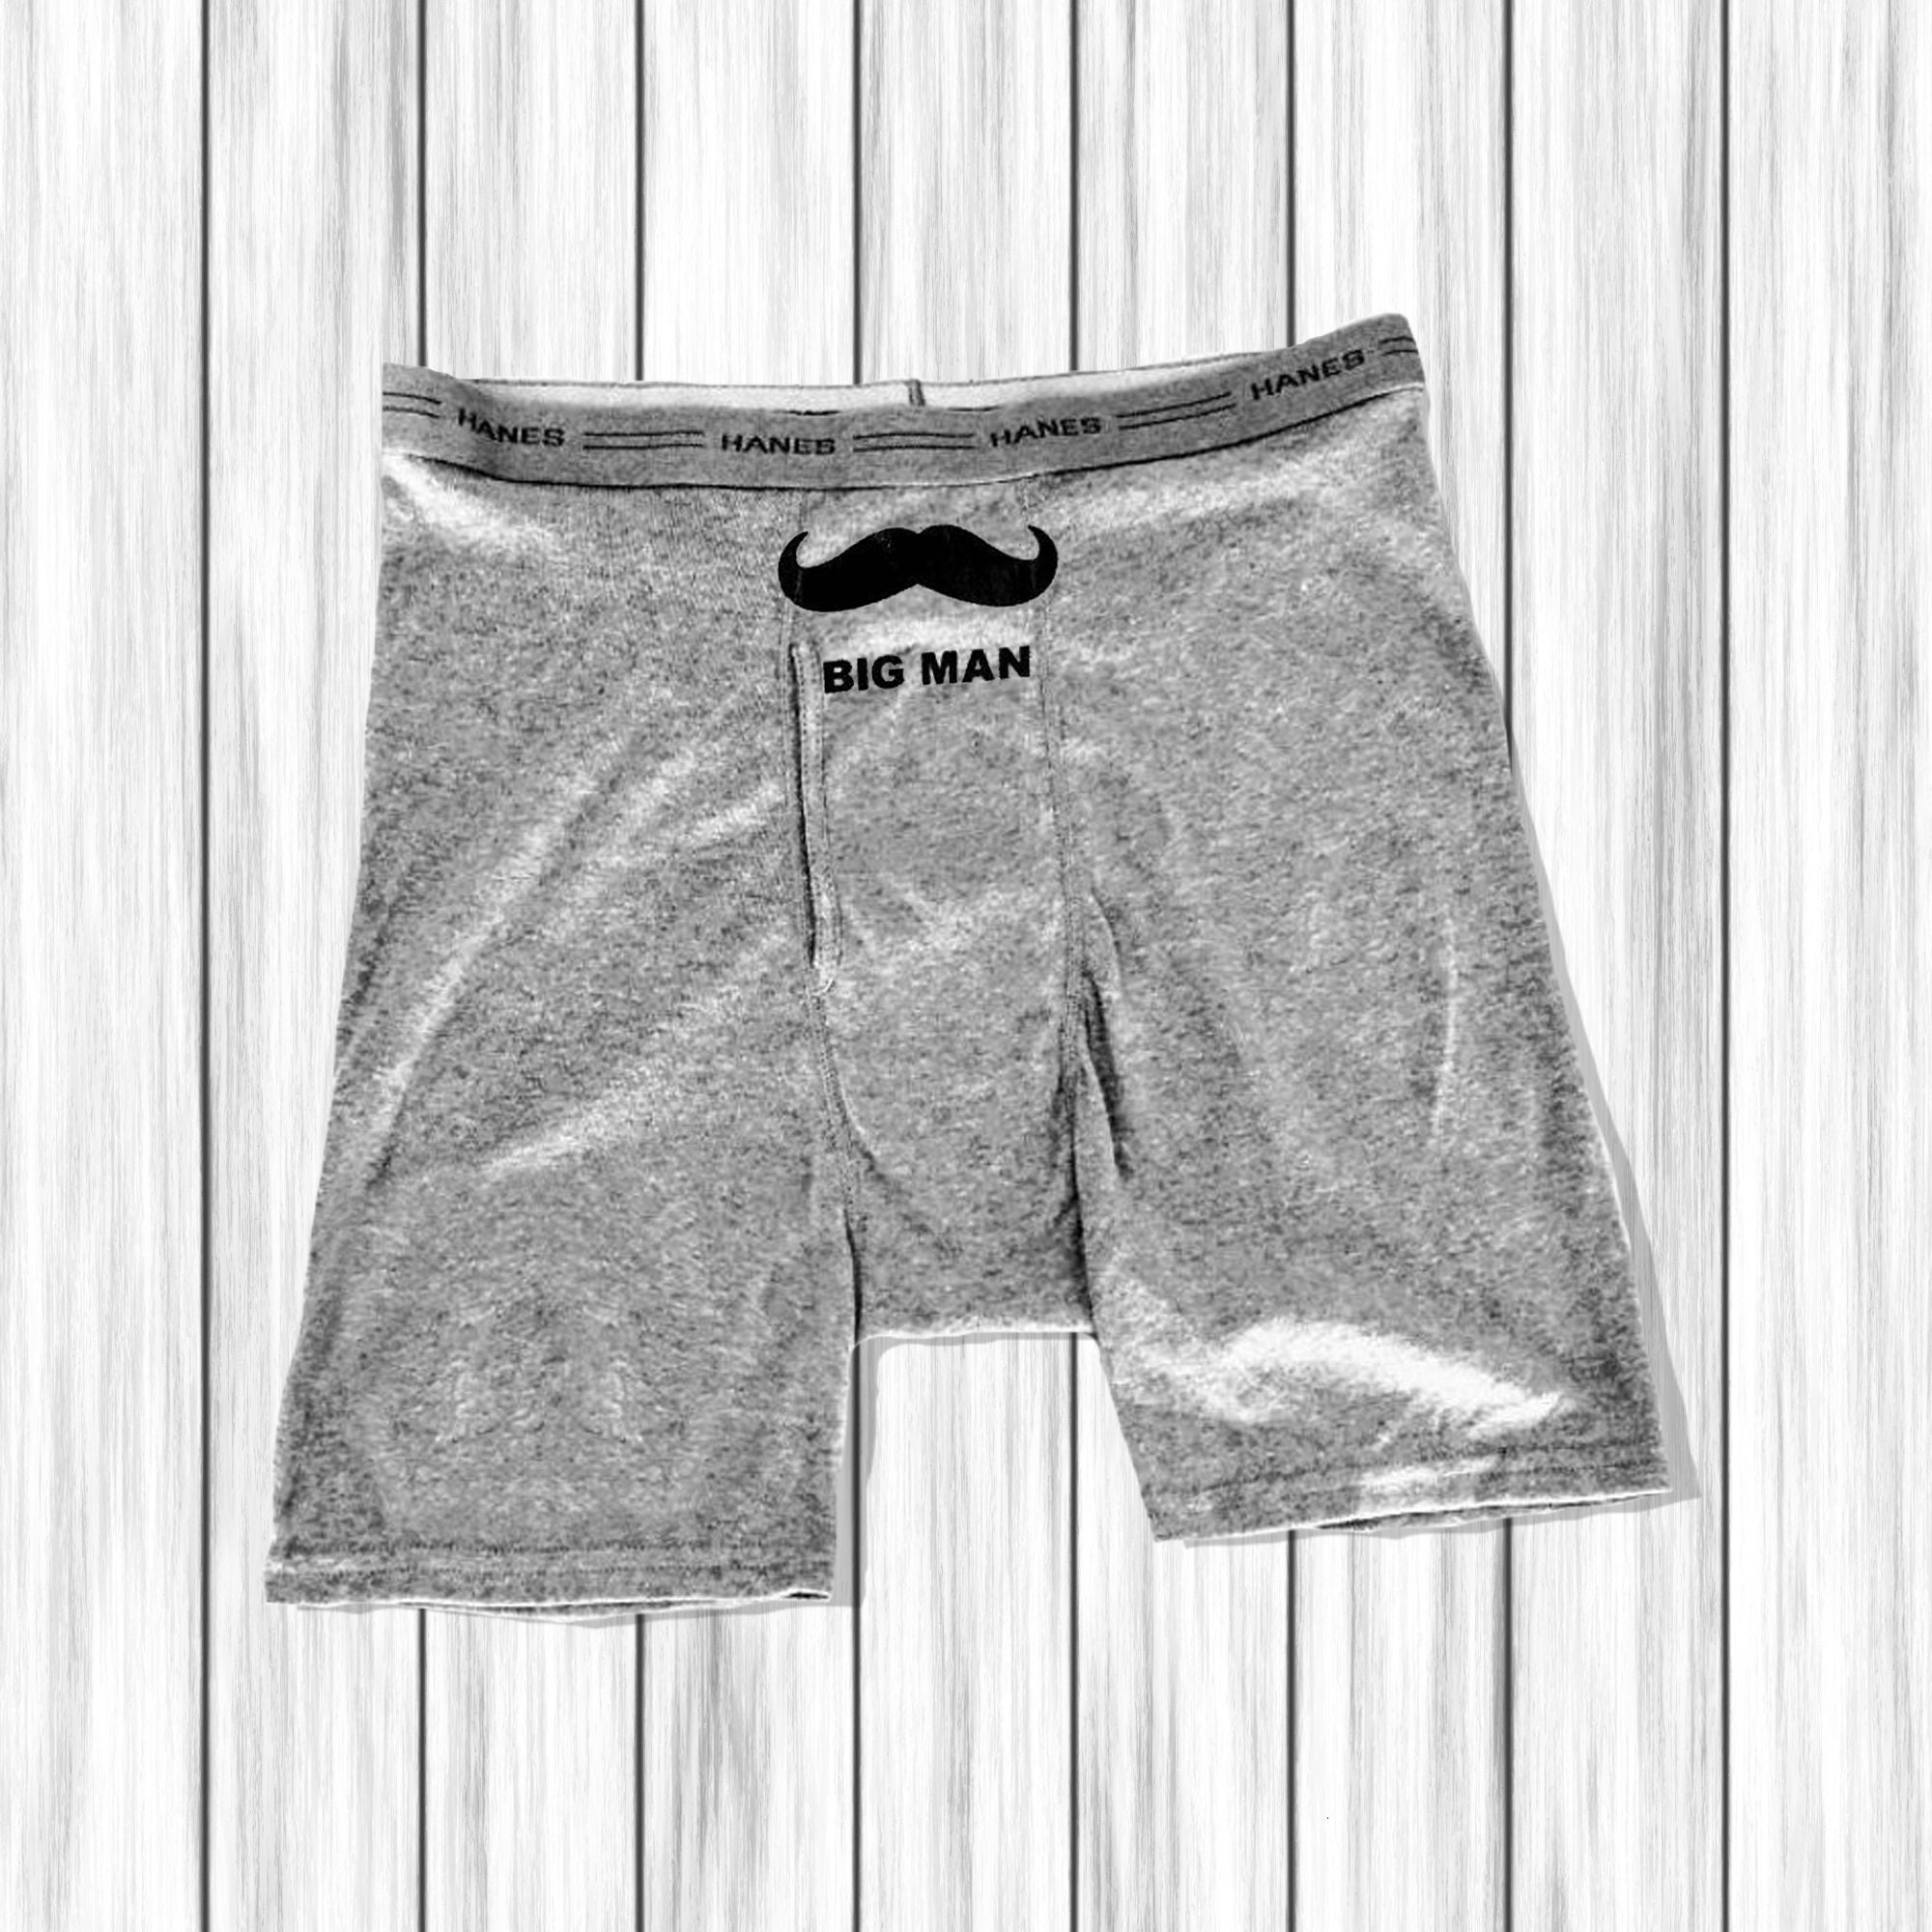 Tyhengta Mens Comfort Soft Briefs Low Rise Breathabl Cotton Underwear